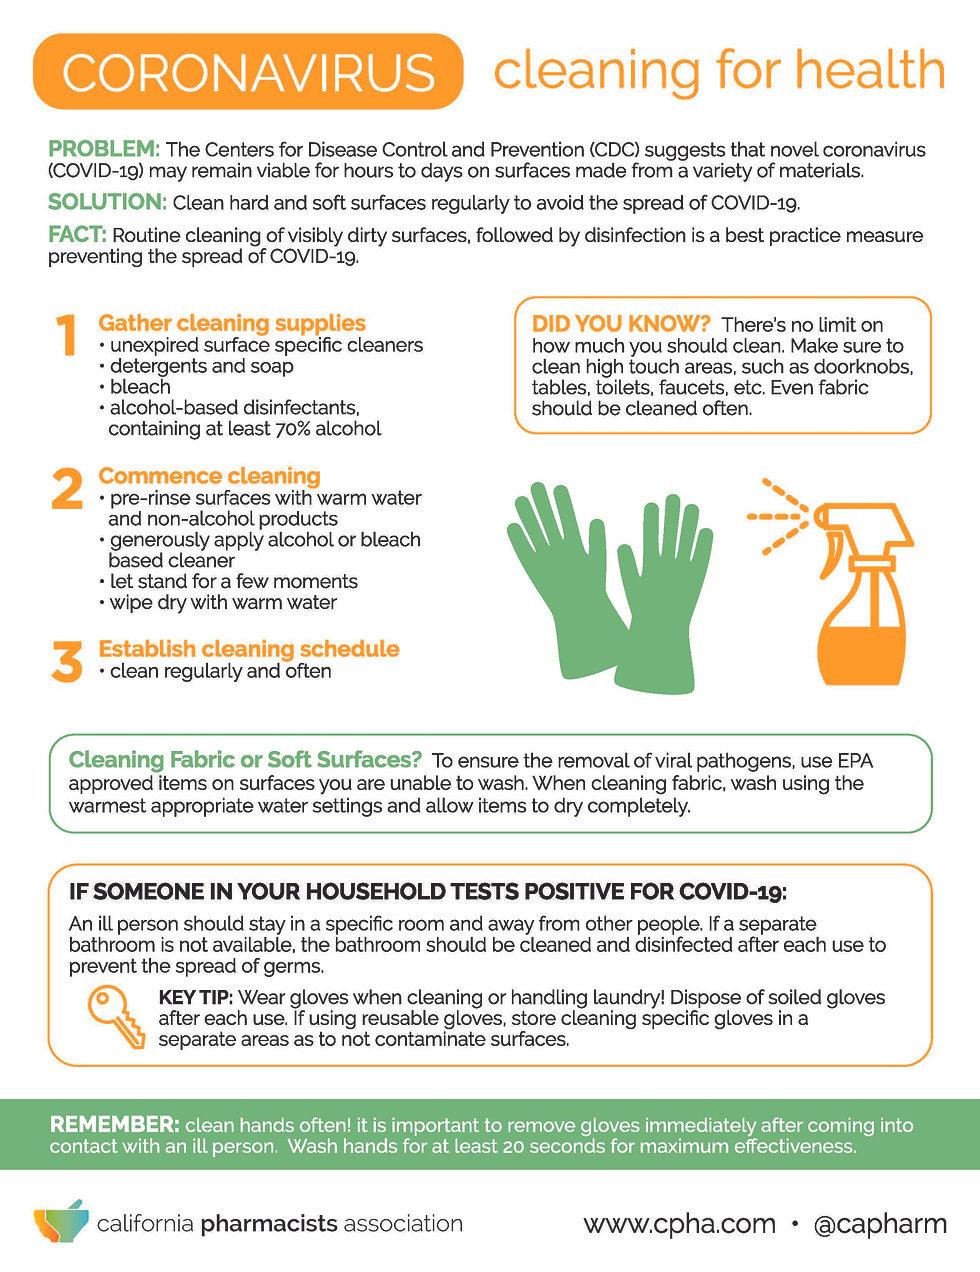 Coronavirus-Cleaning-for-Health.jpg